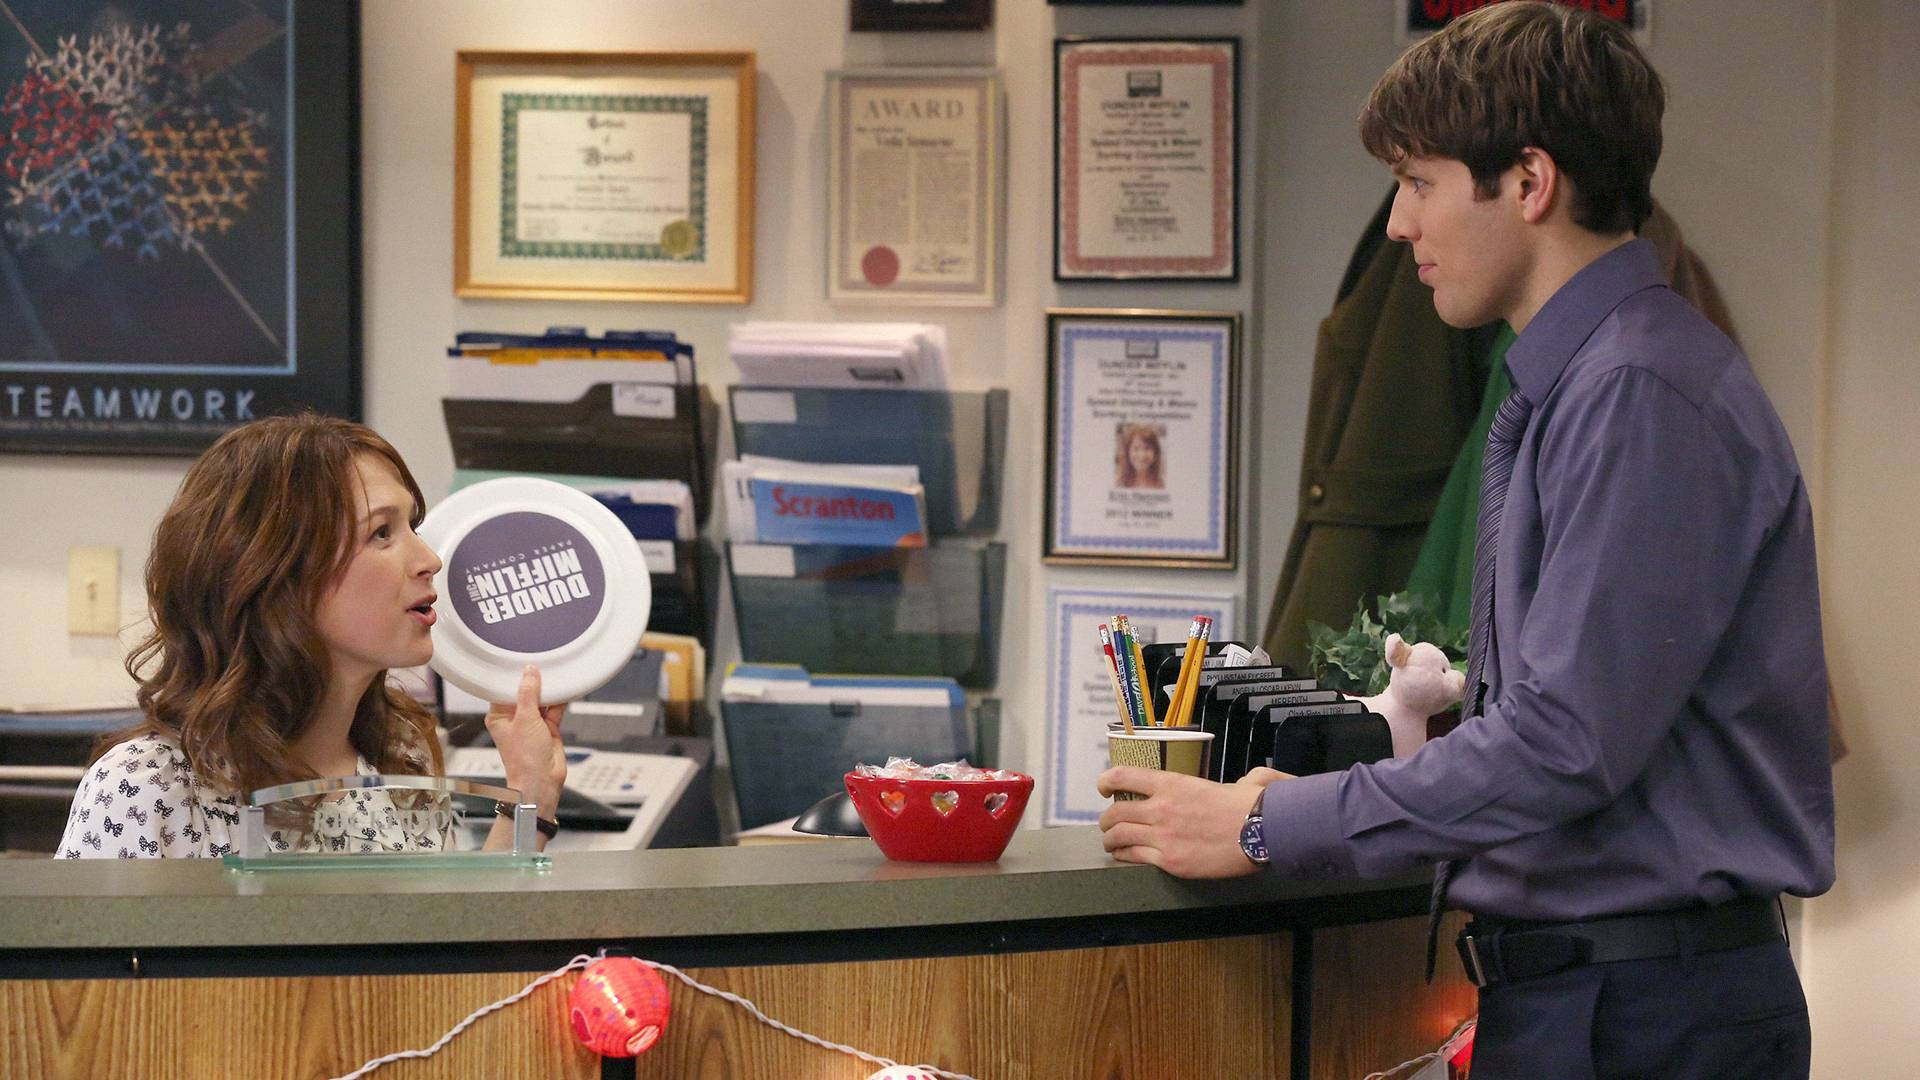 The Office Season 9 Episode 15